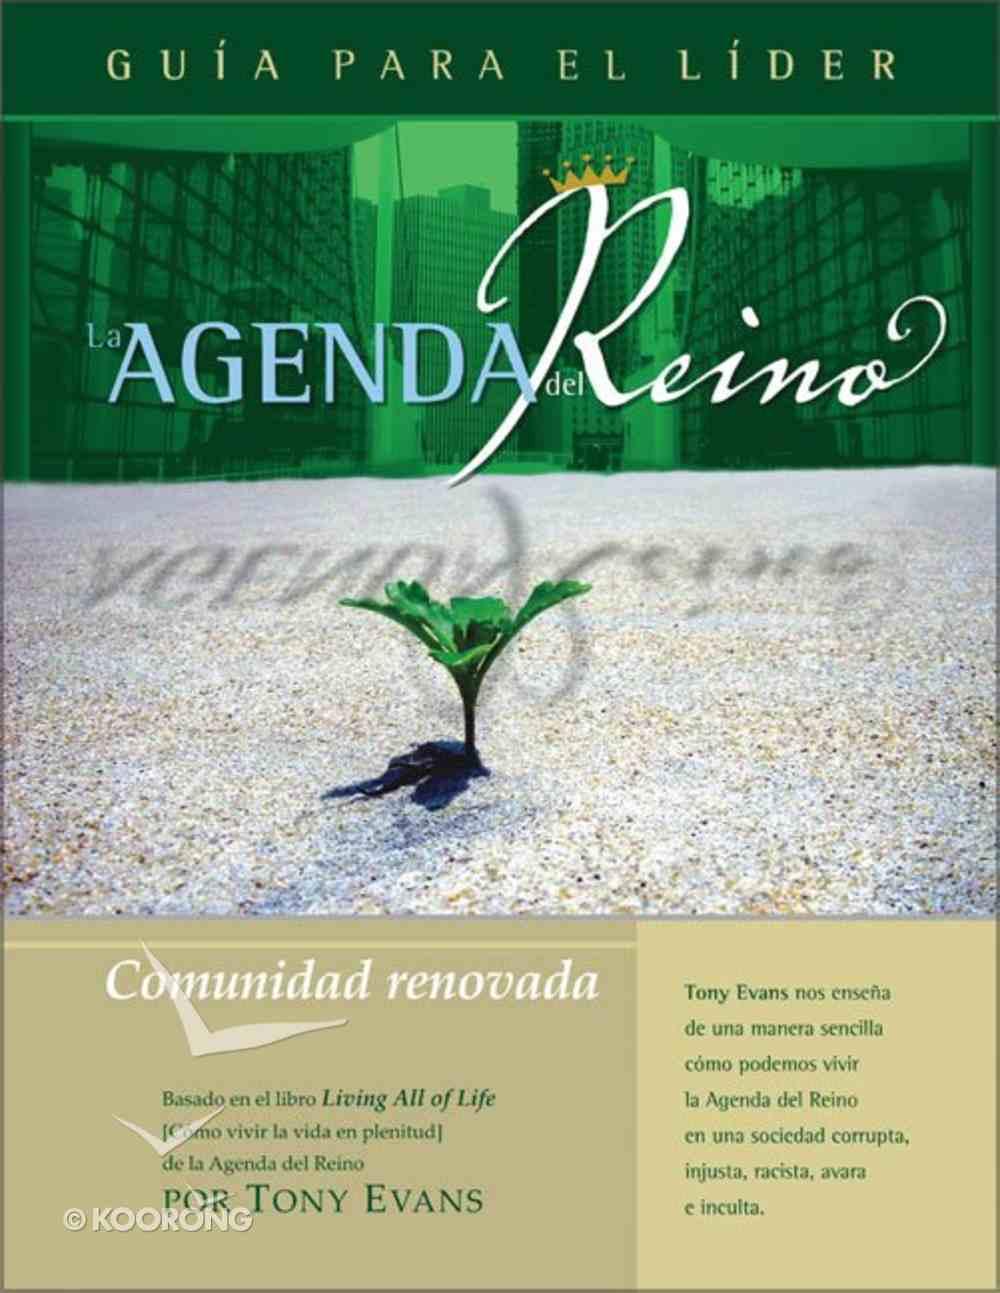 Agenda Del Reino Para Una Comunidad Renovada (Kingdom Agenda For A Renewed Community, The Leader's Guide) Paperback